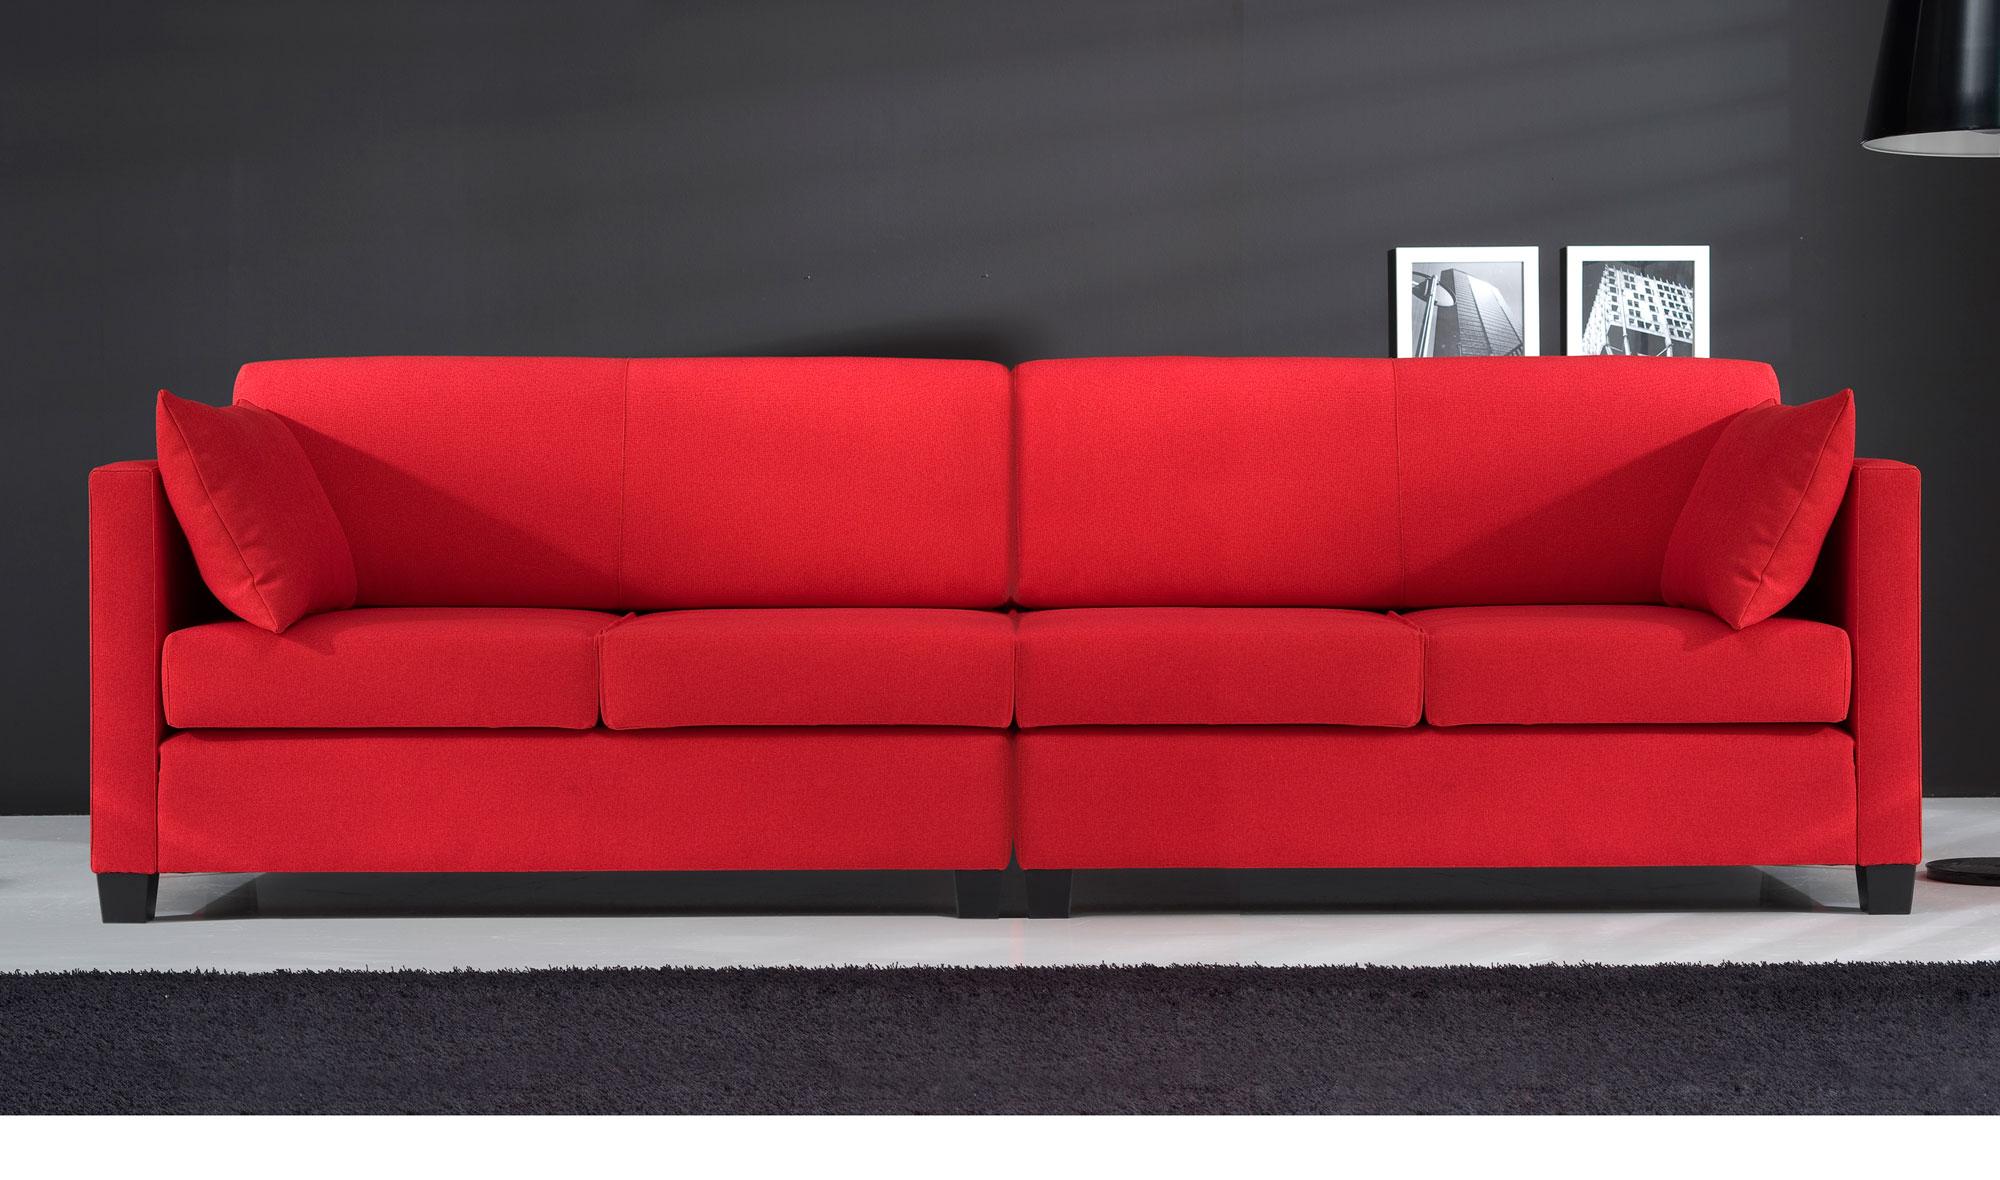 Muebles sofas 87dx sofà Cama Moderno Luppo En Portobellostreet